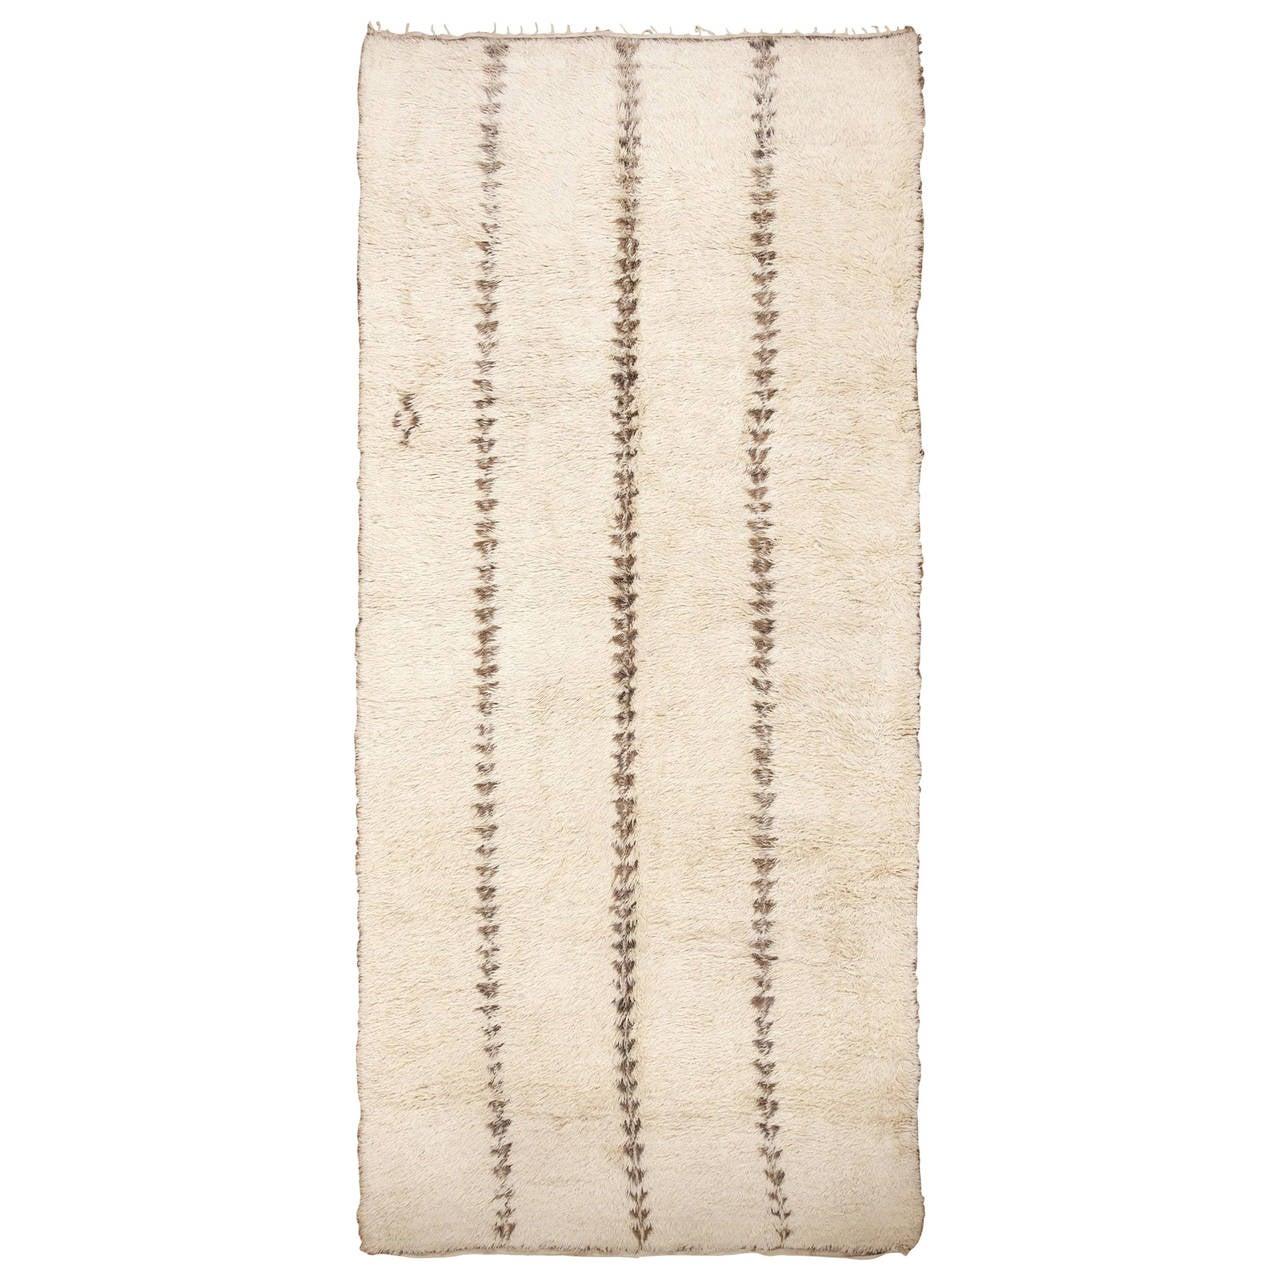 Minimalist Tribal Vintage Moroccan Rug For Sale